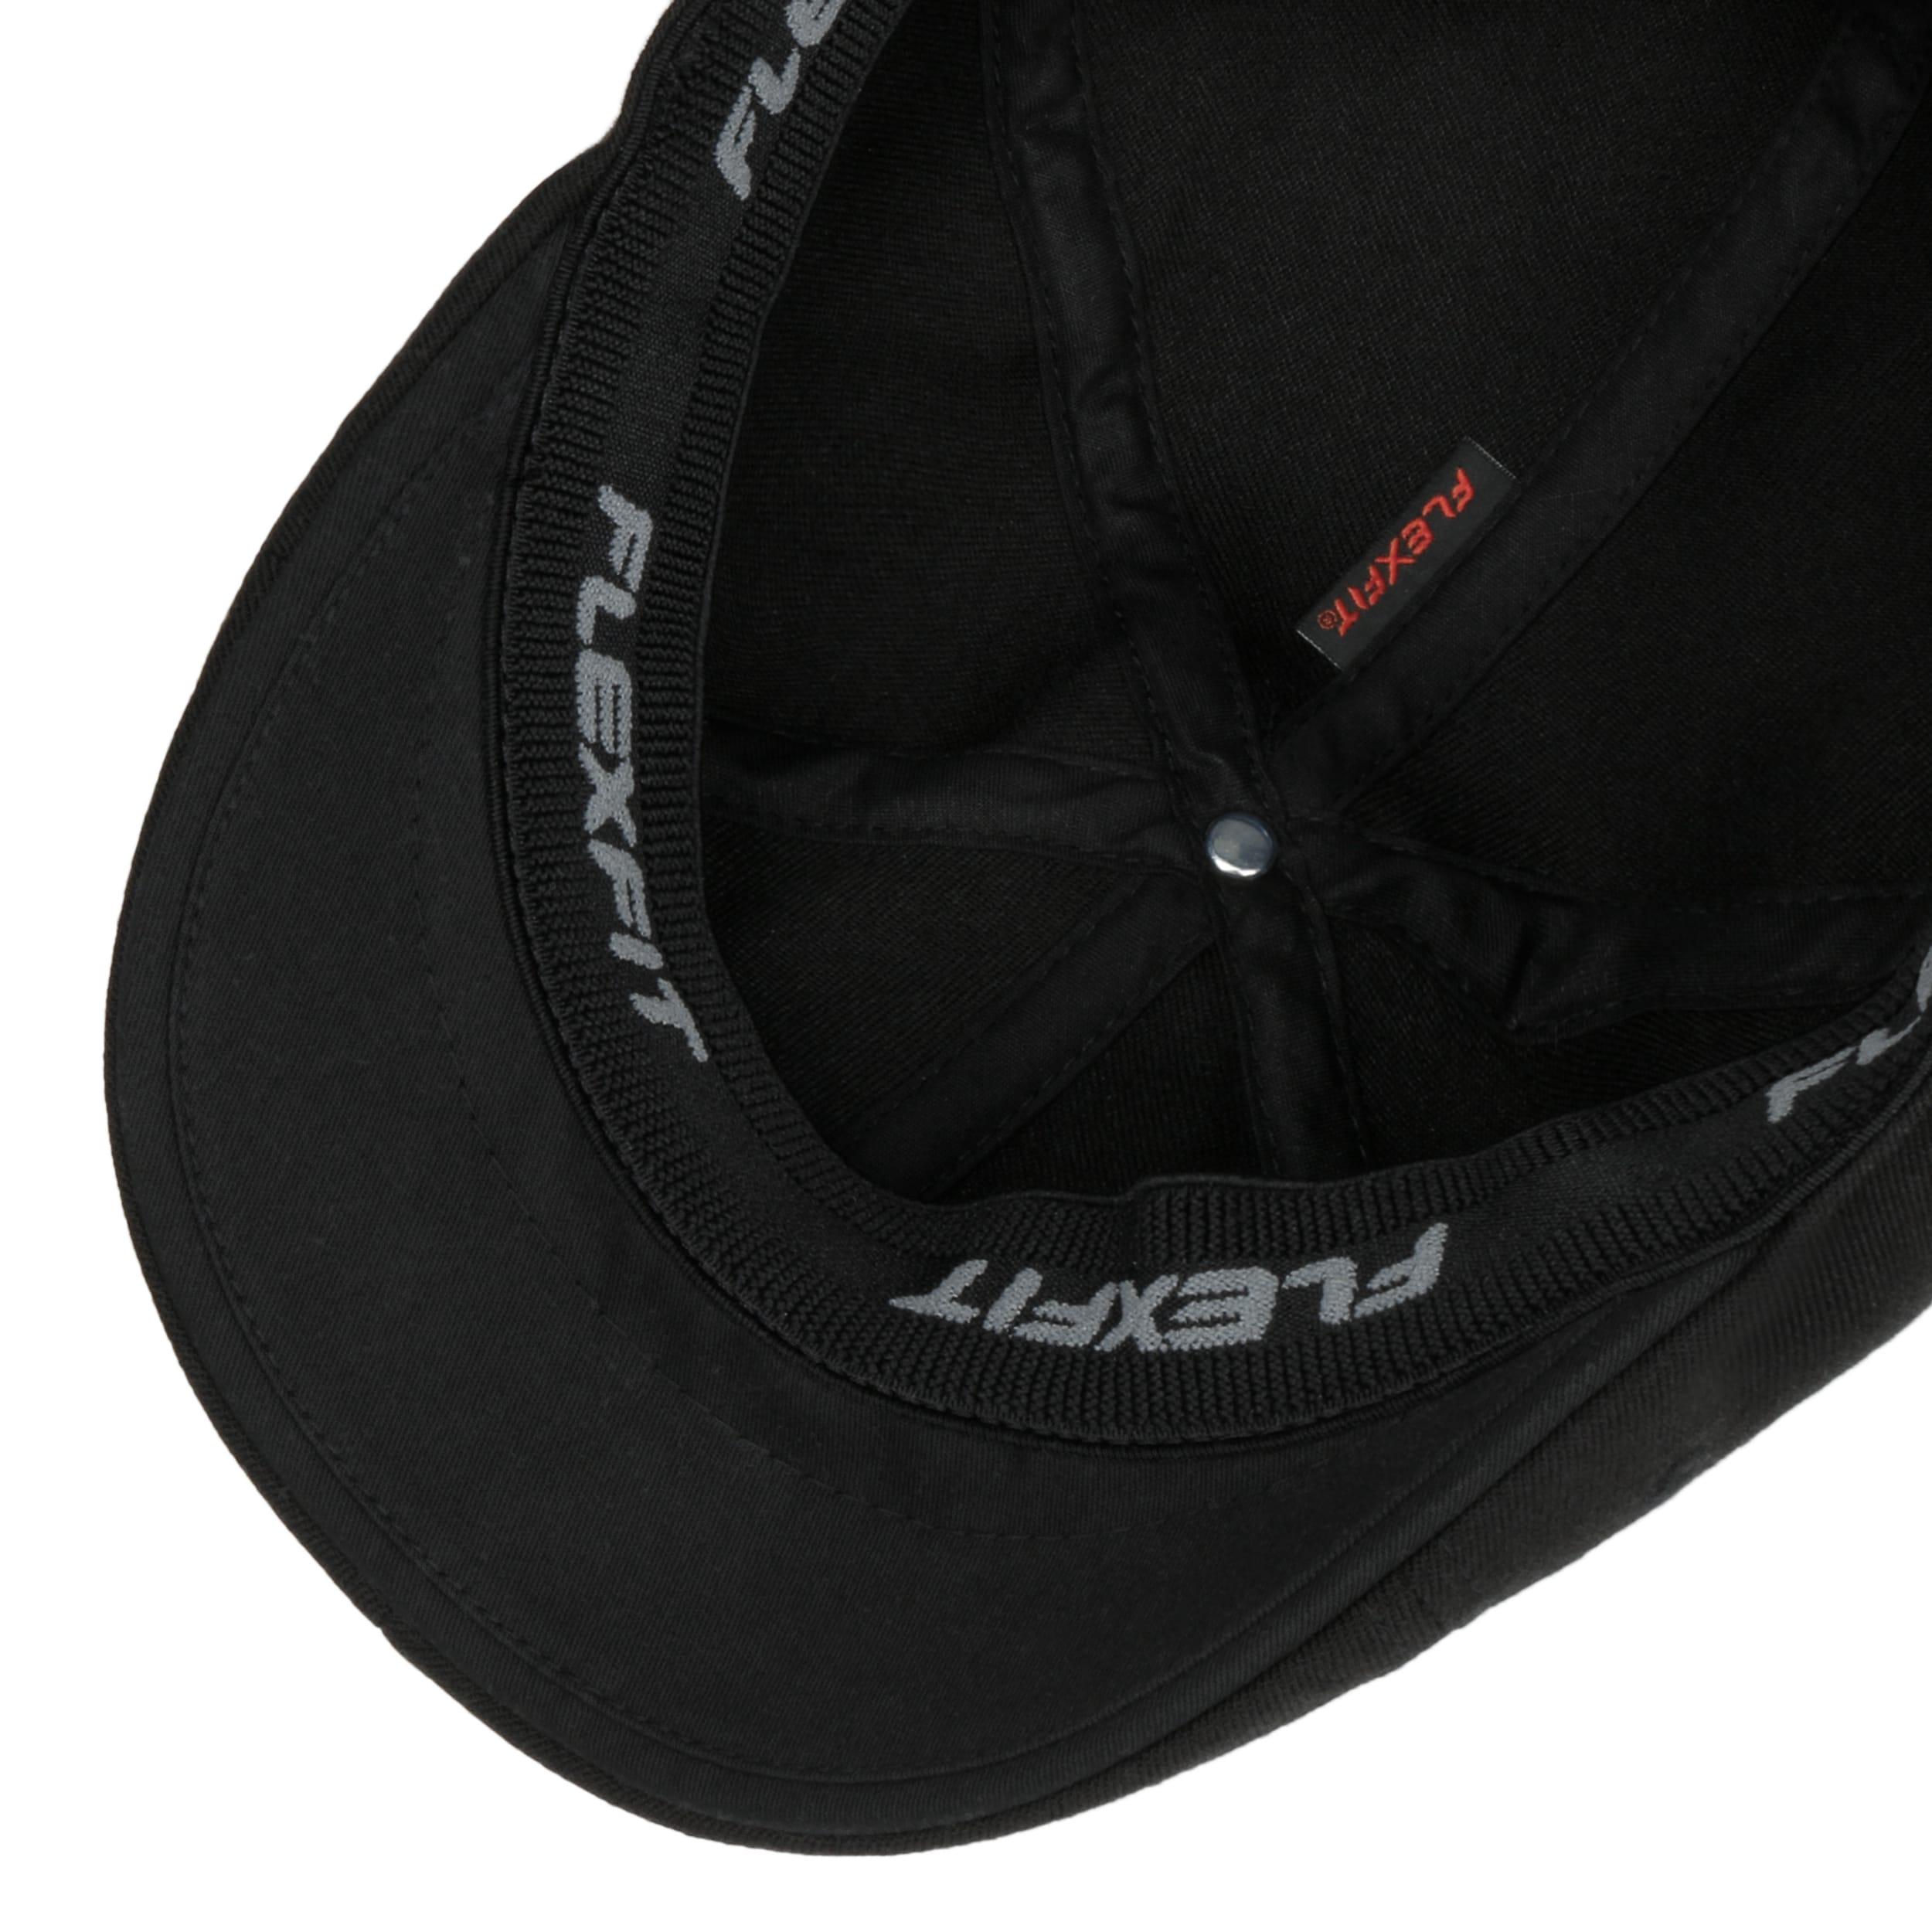 661c2d3f01c95 ... 504 Flexfit Flat Cap by Kangol - black 2 ...